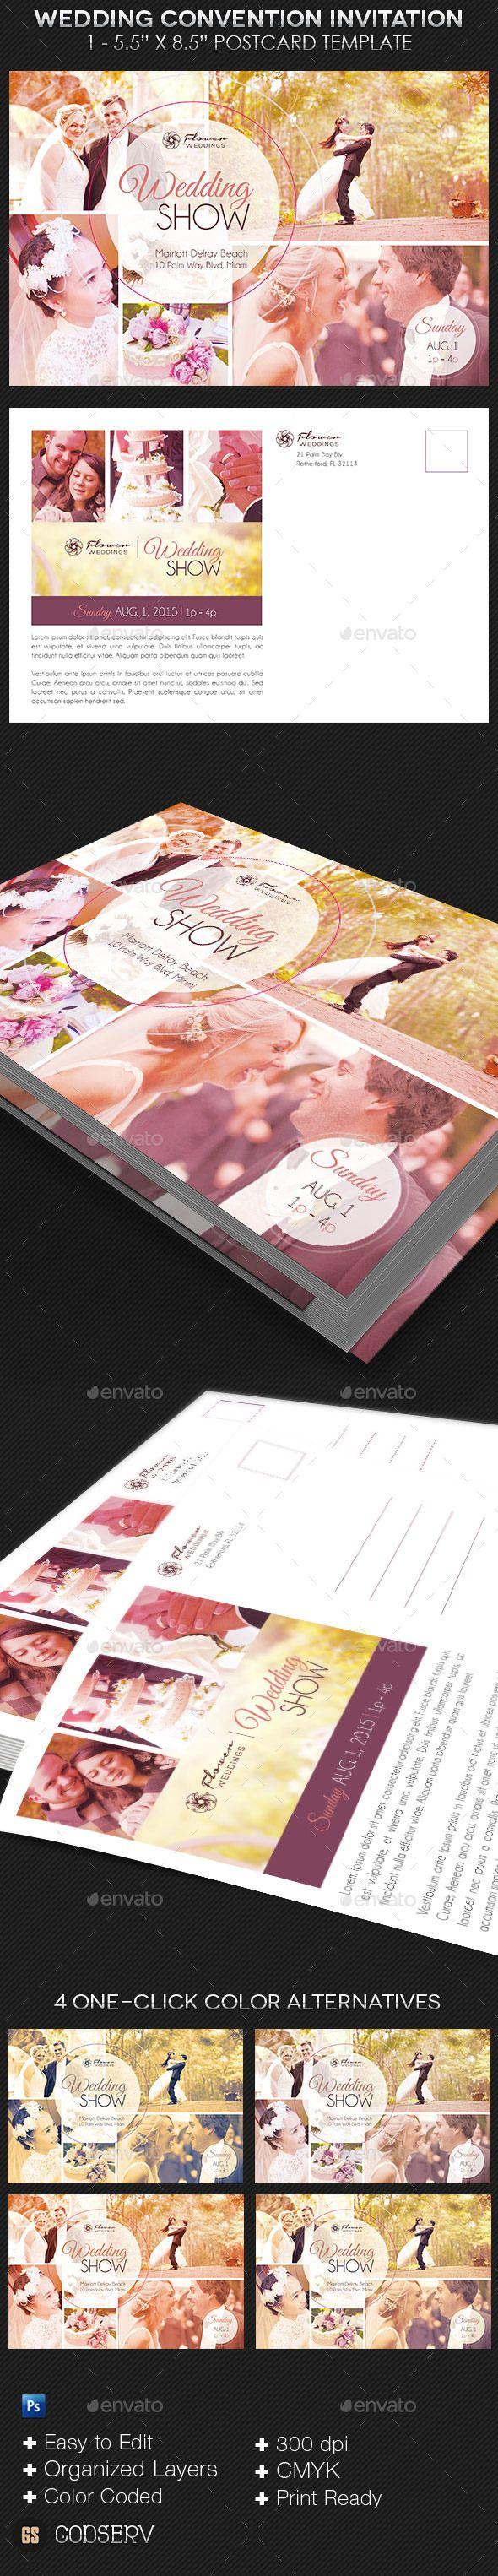 business event invitation templates%0A Wedding Convention Invitation Template